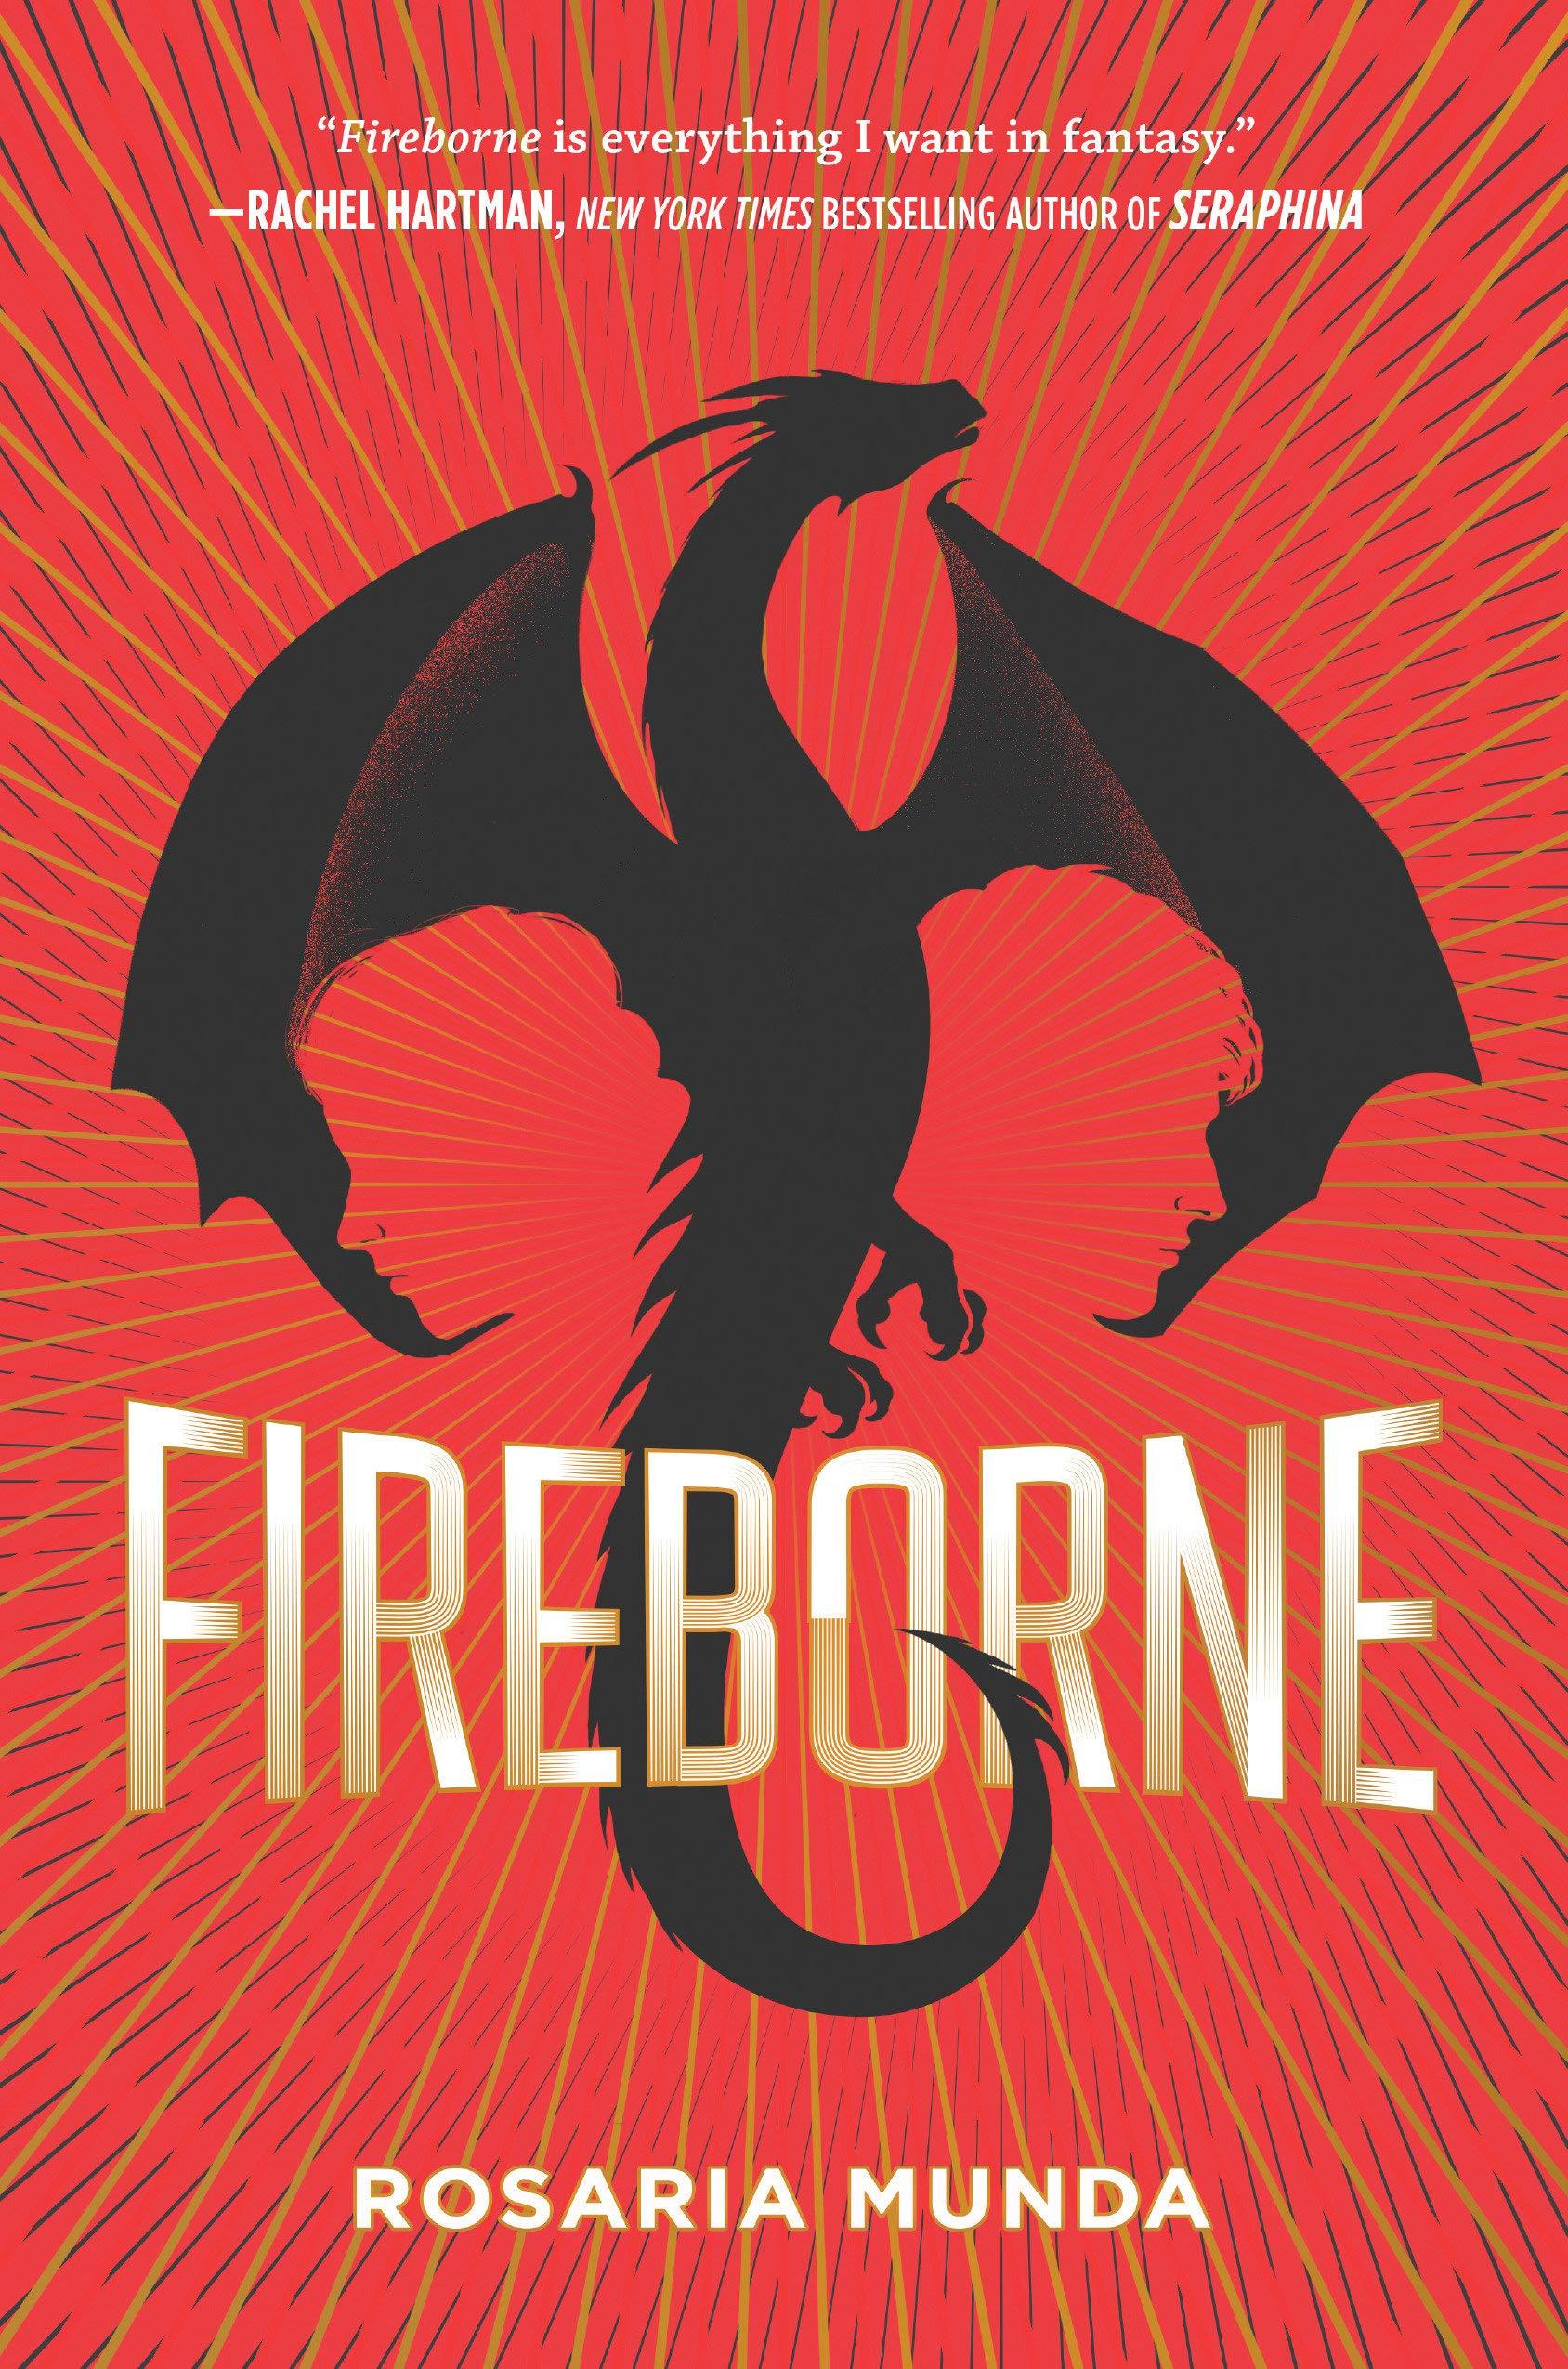 Amazon.com: Fireborne (THE AURELIAN CYCLE): hero's equal: Munda, Rosaria:  Books